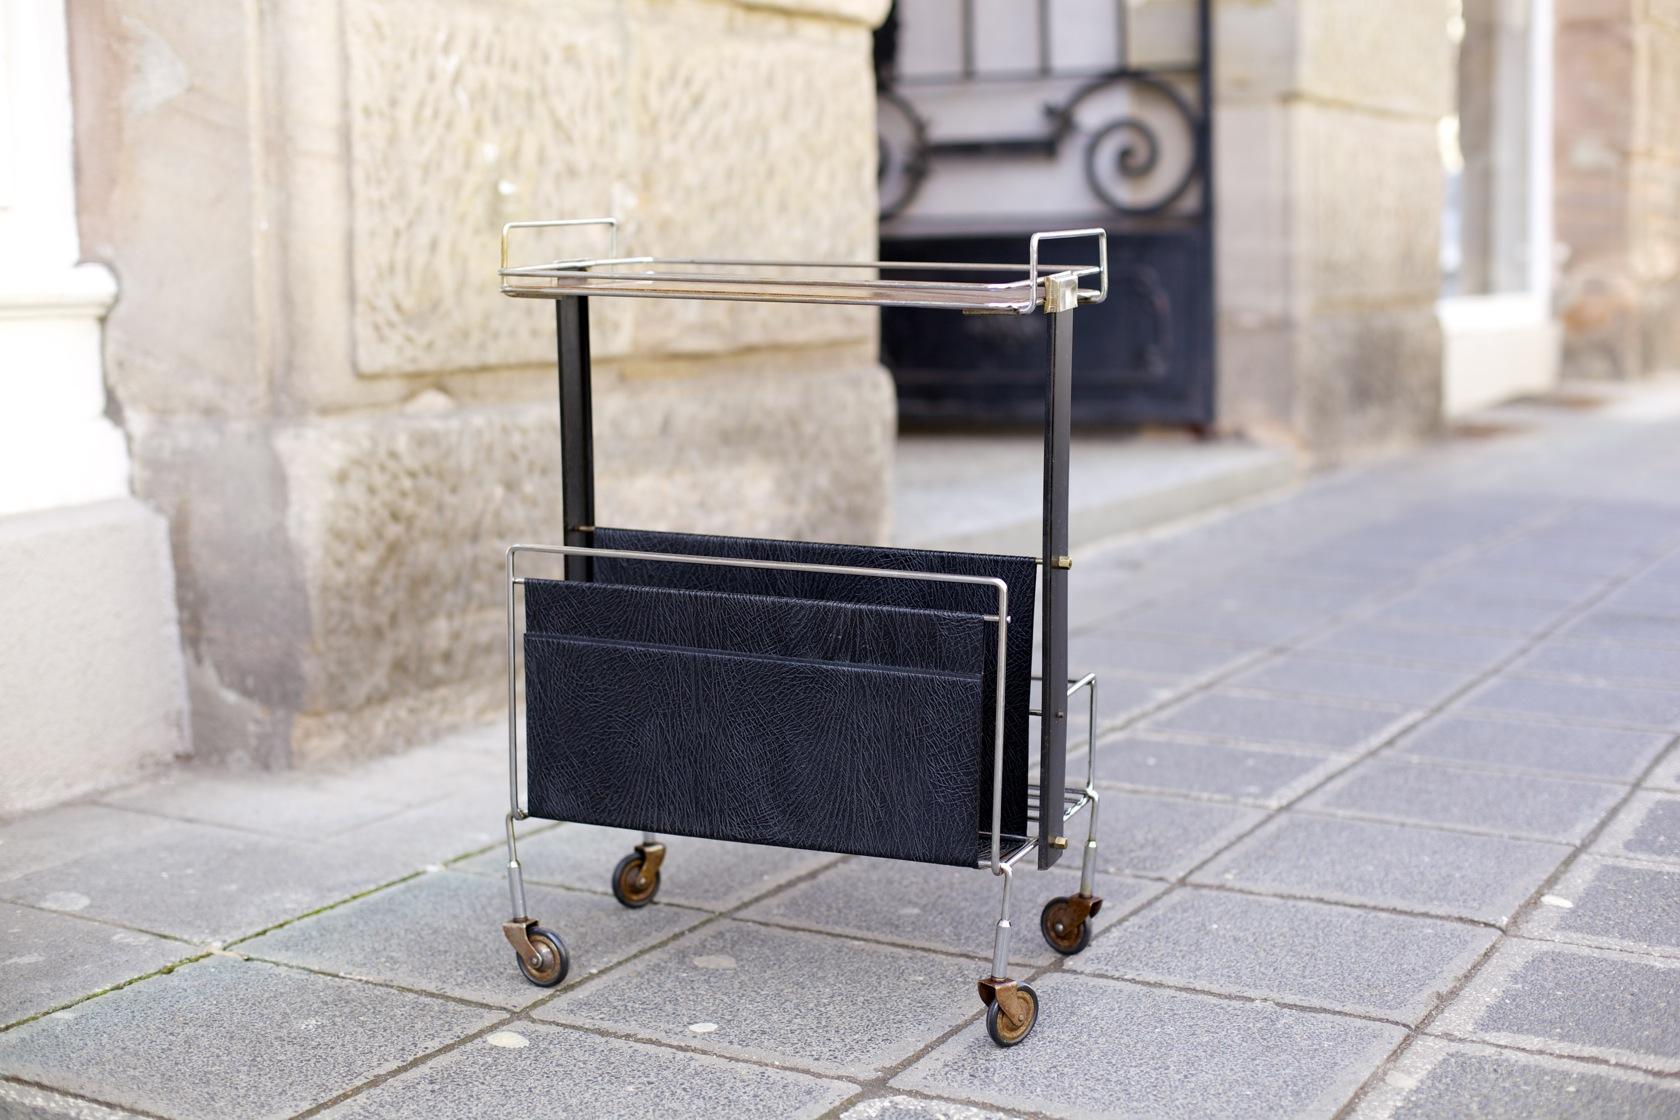 multifunktionsm bel aus den 50er jahren raumwunder vintage wohnen in n rnberg. Black Bedroom Furniture Sets. Home Design Ideas